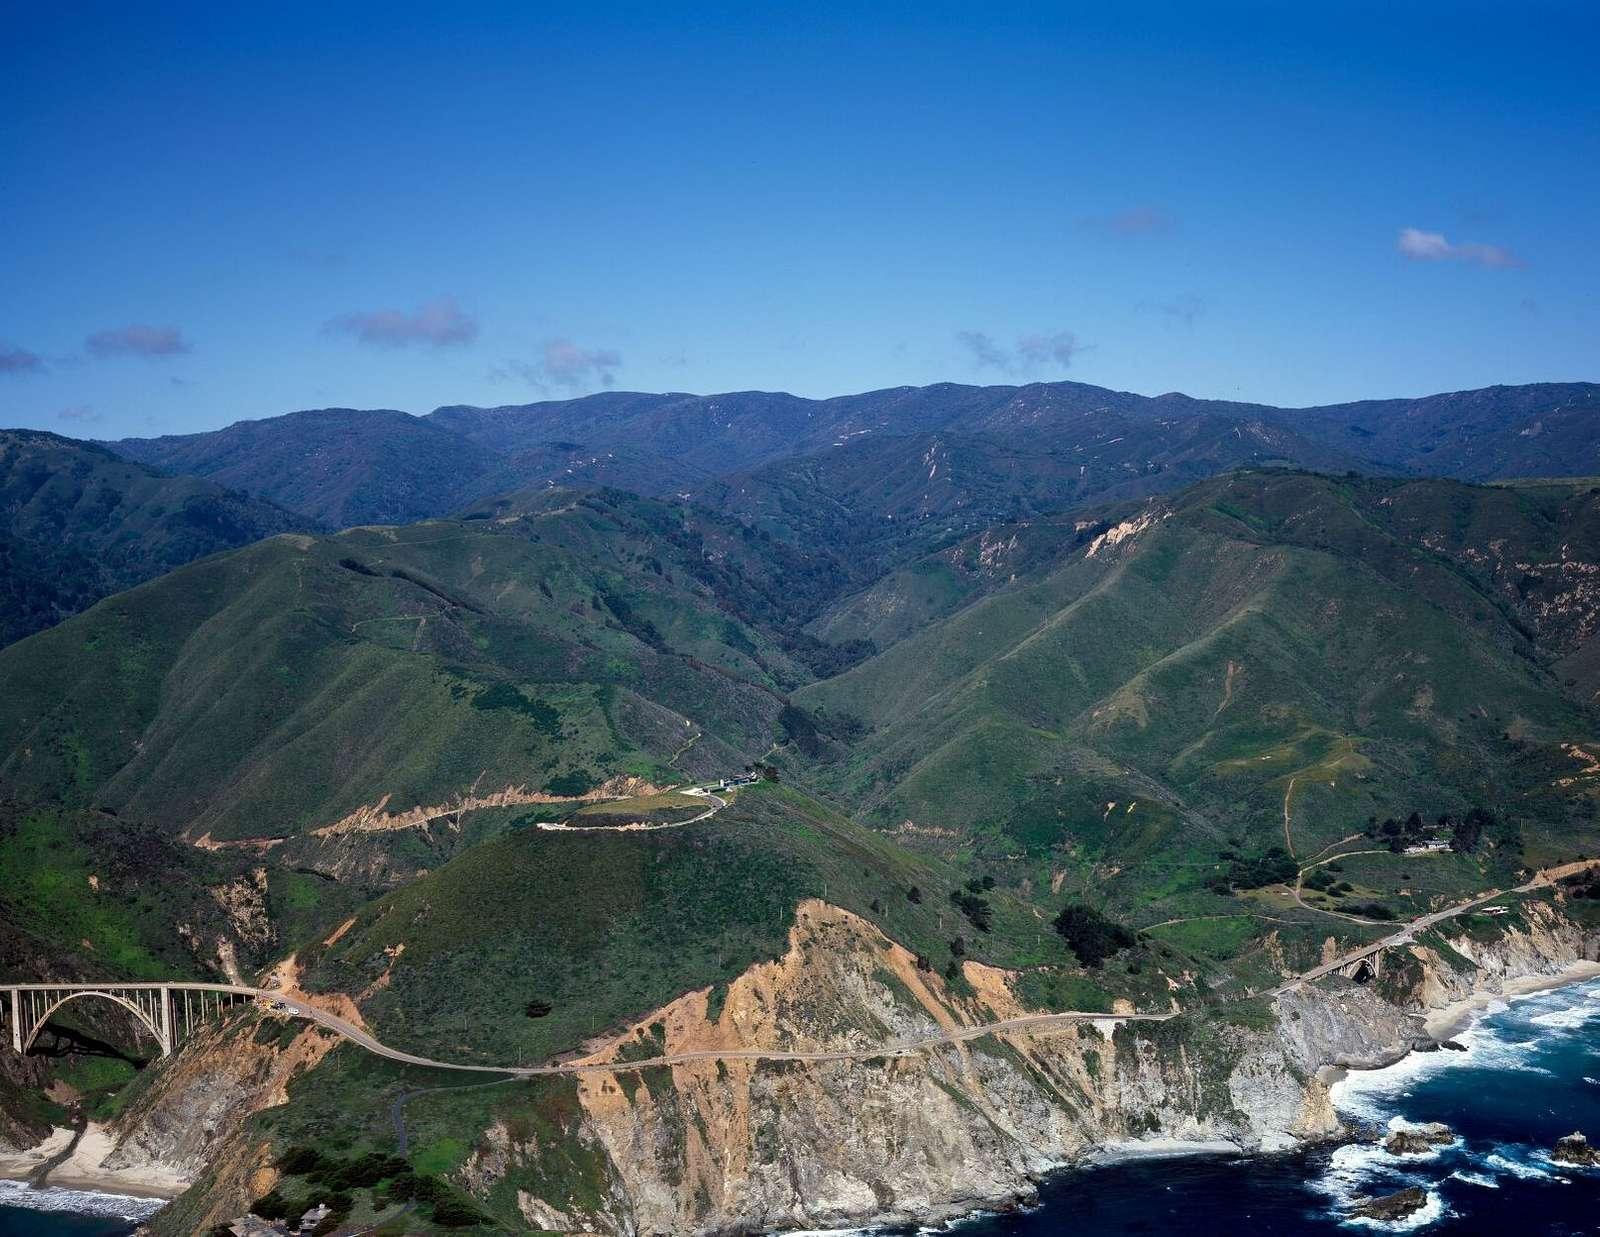 The California coastline near Big Sur